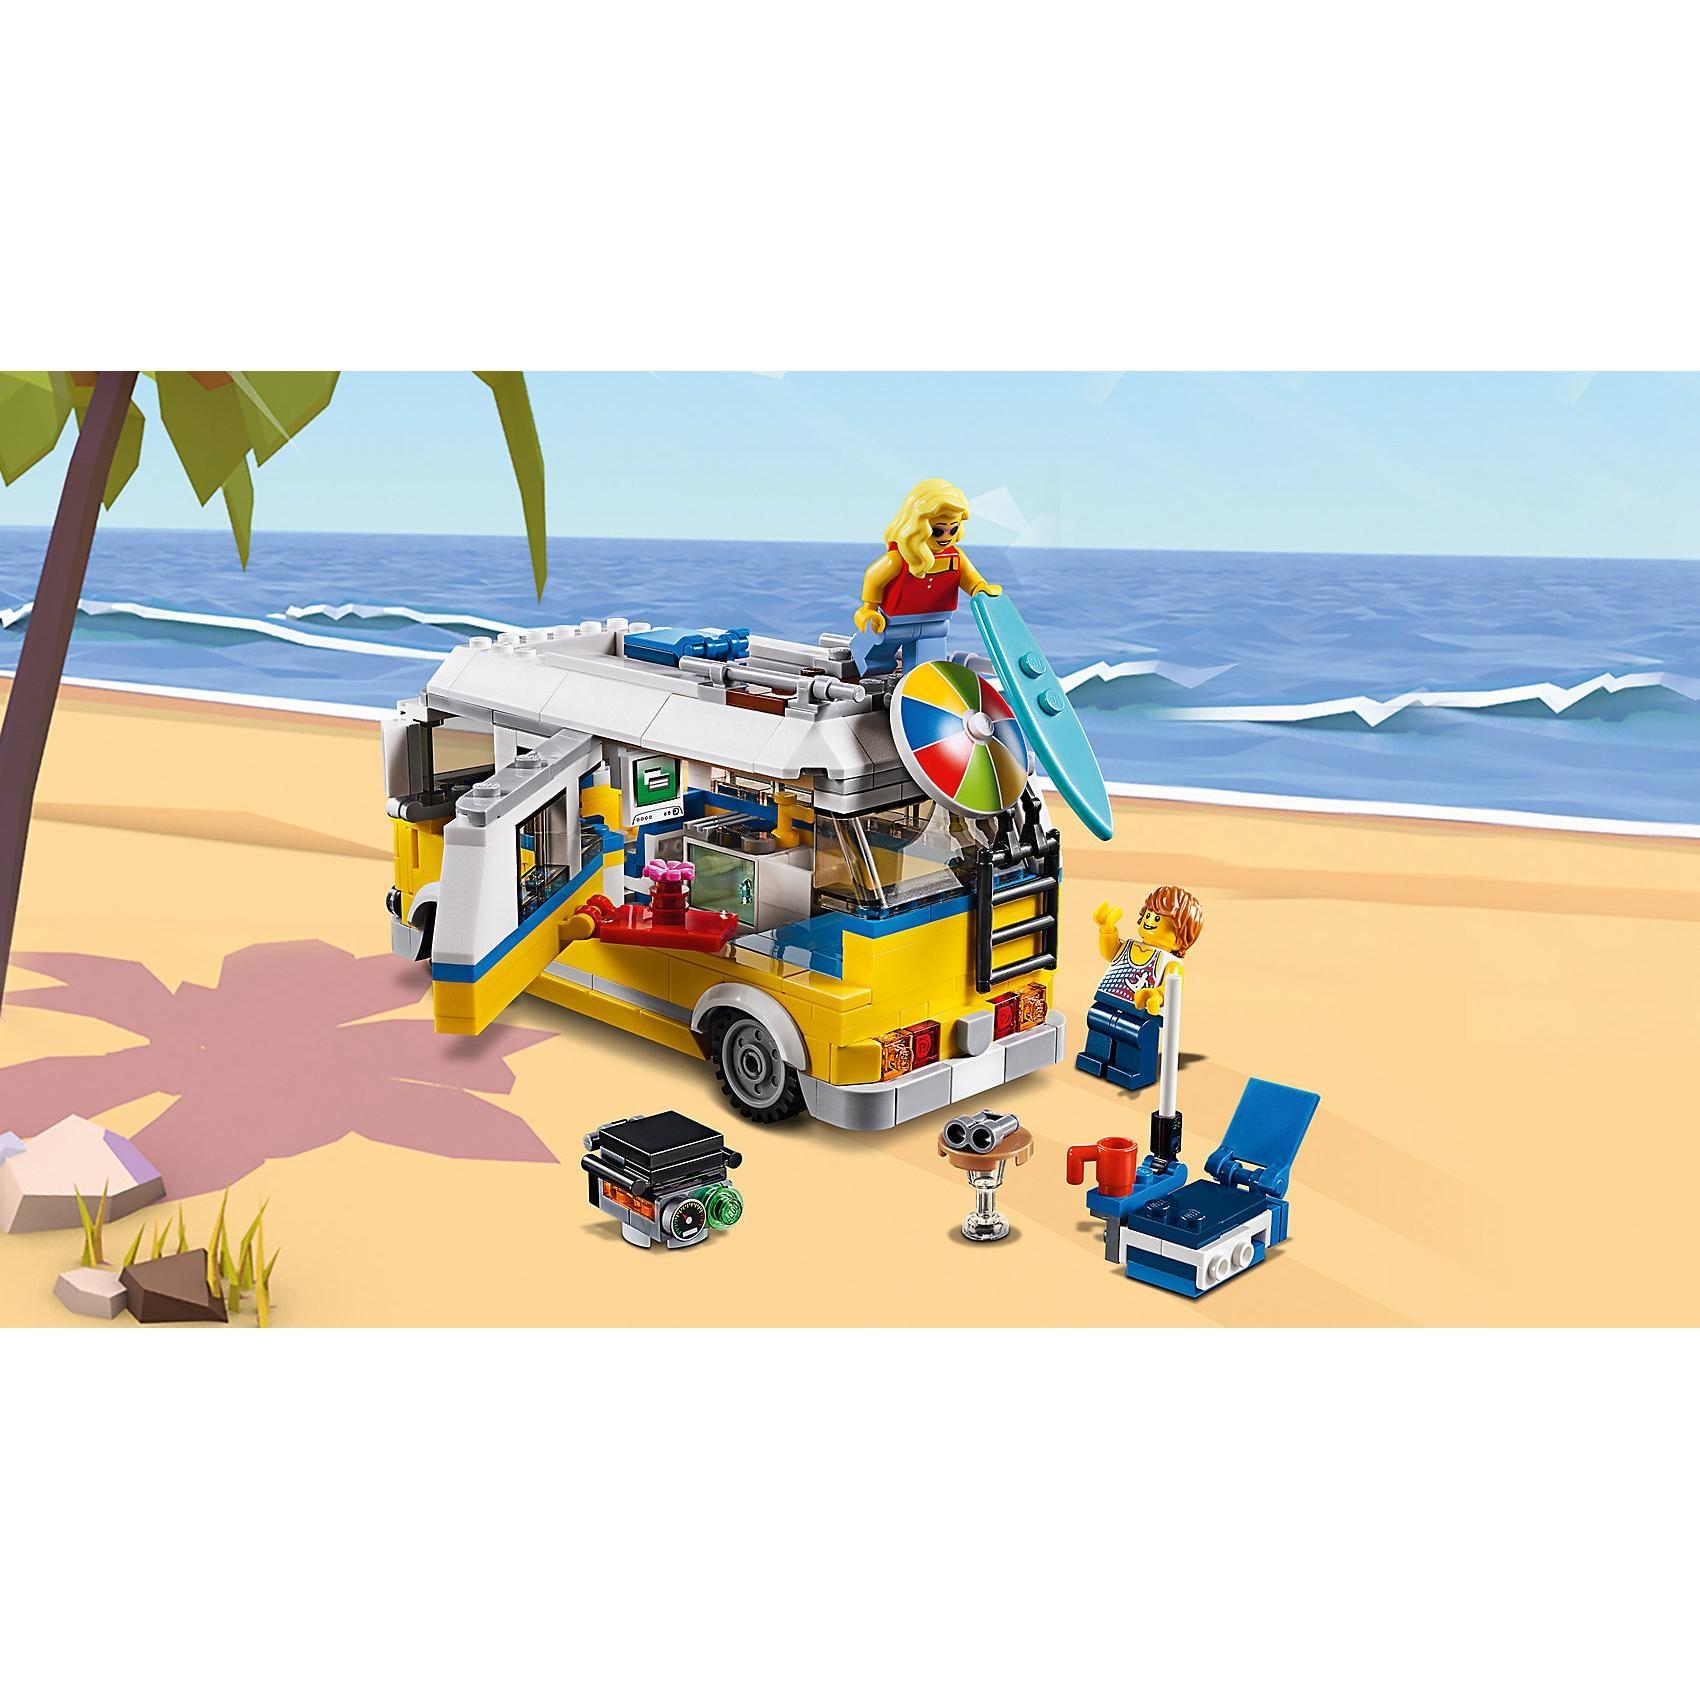 Lego Creator 31079 Surfermobil